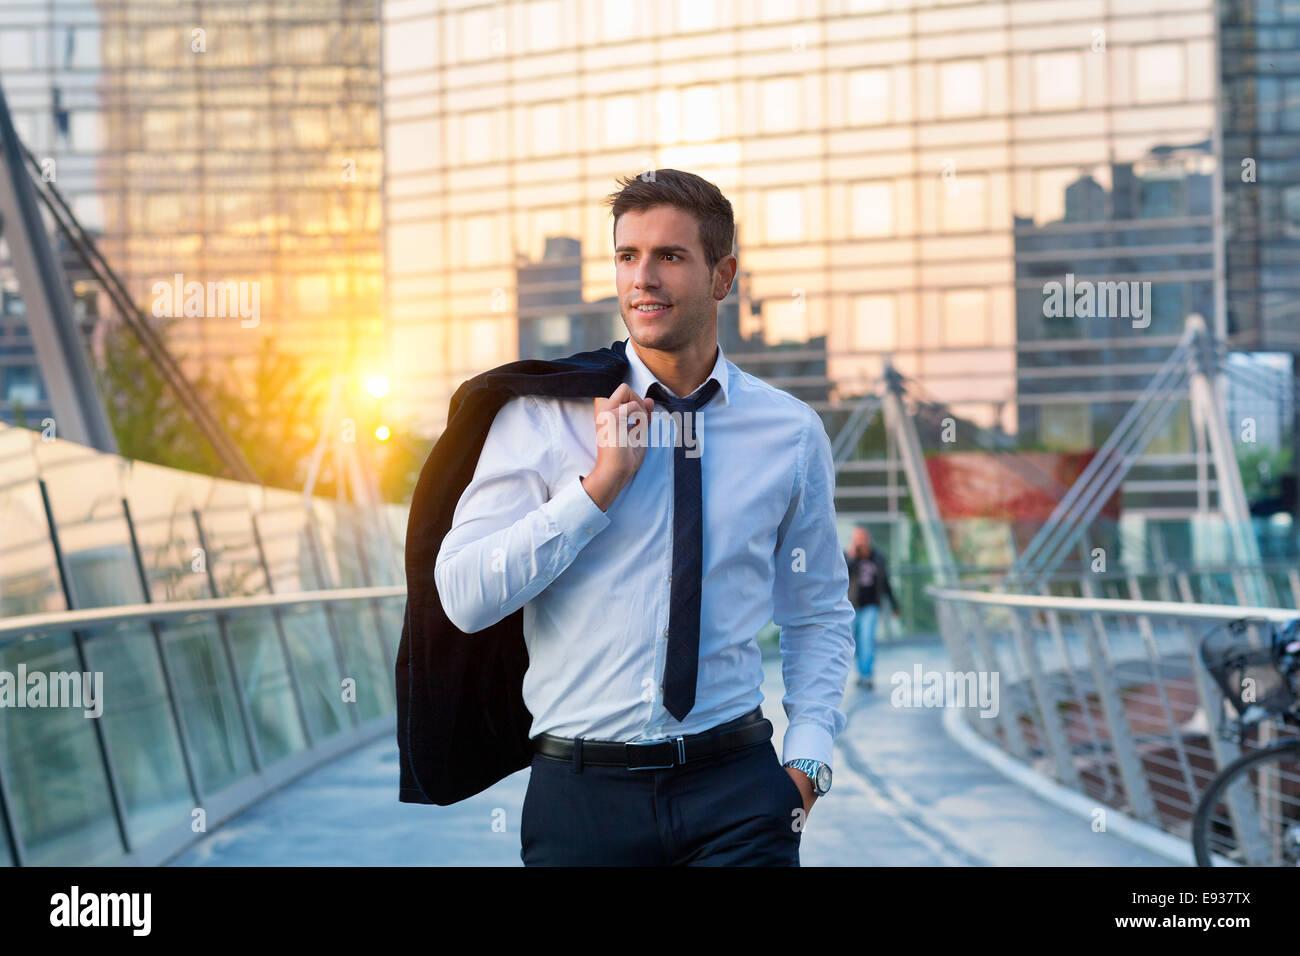 Empresario caminando Imagen De Stock